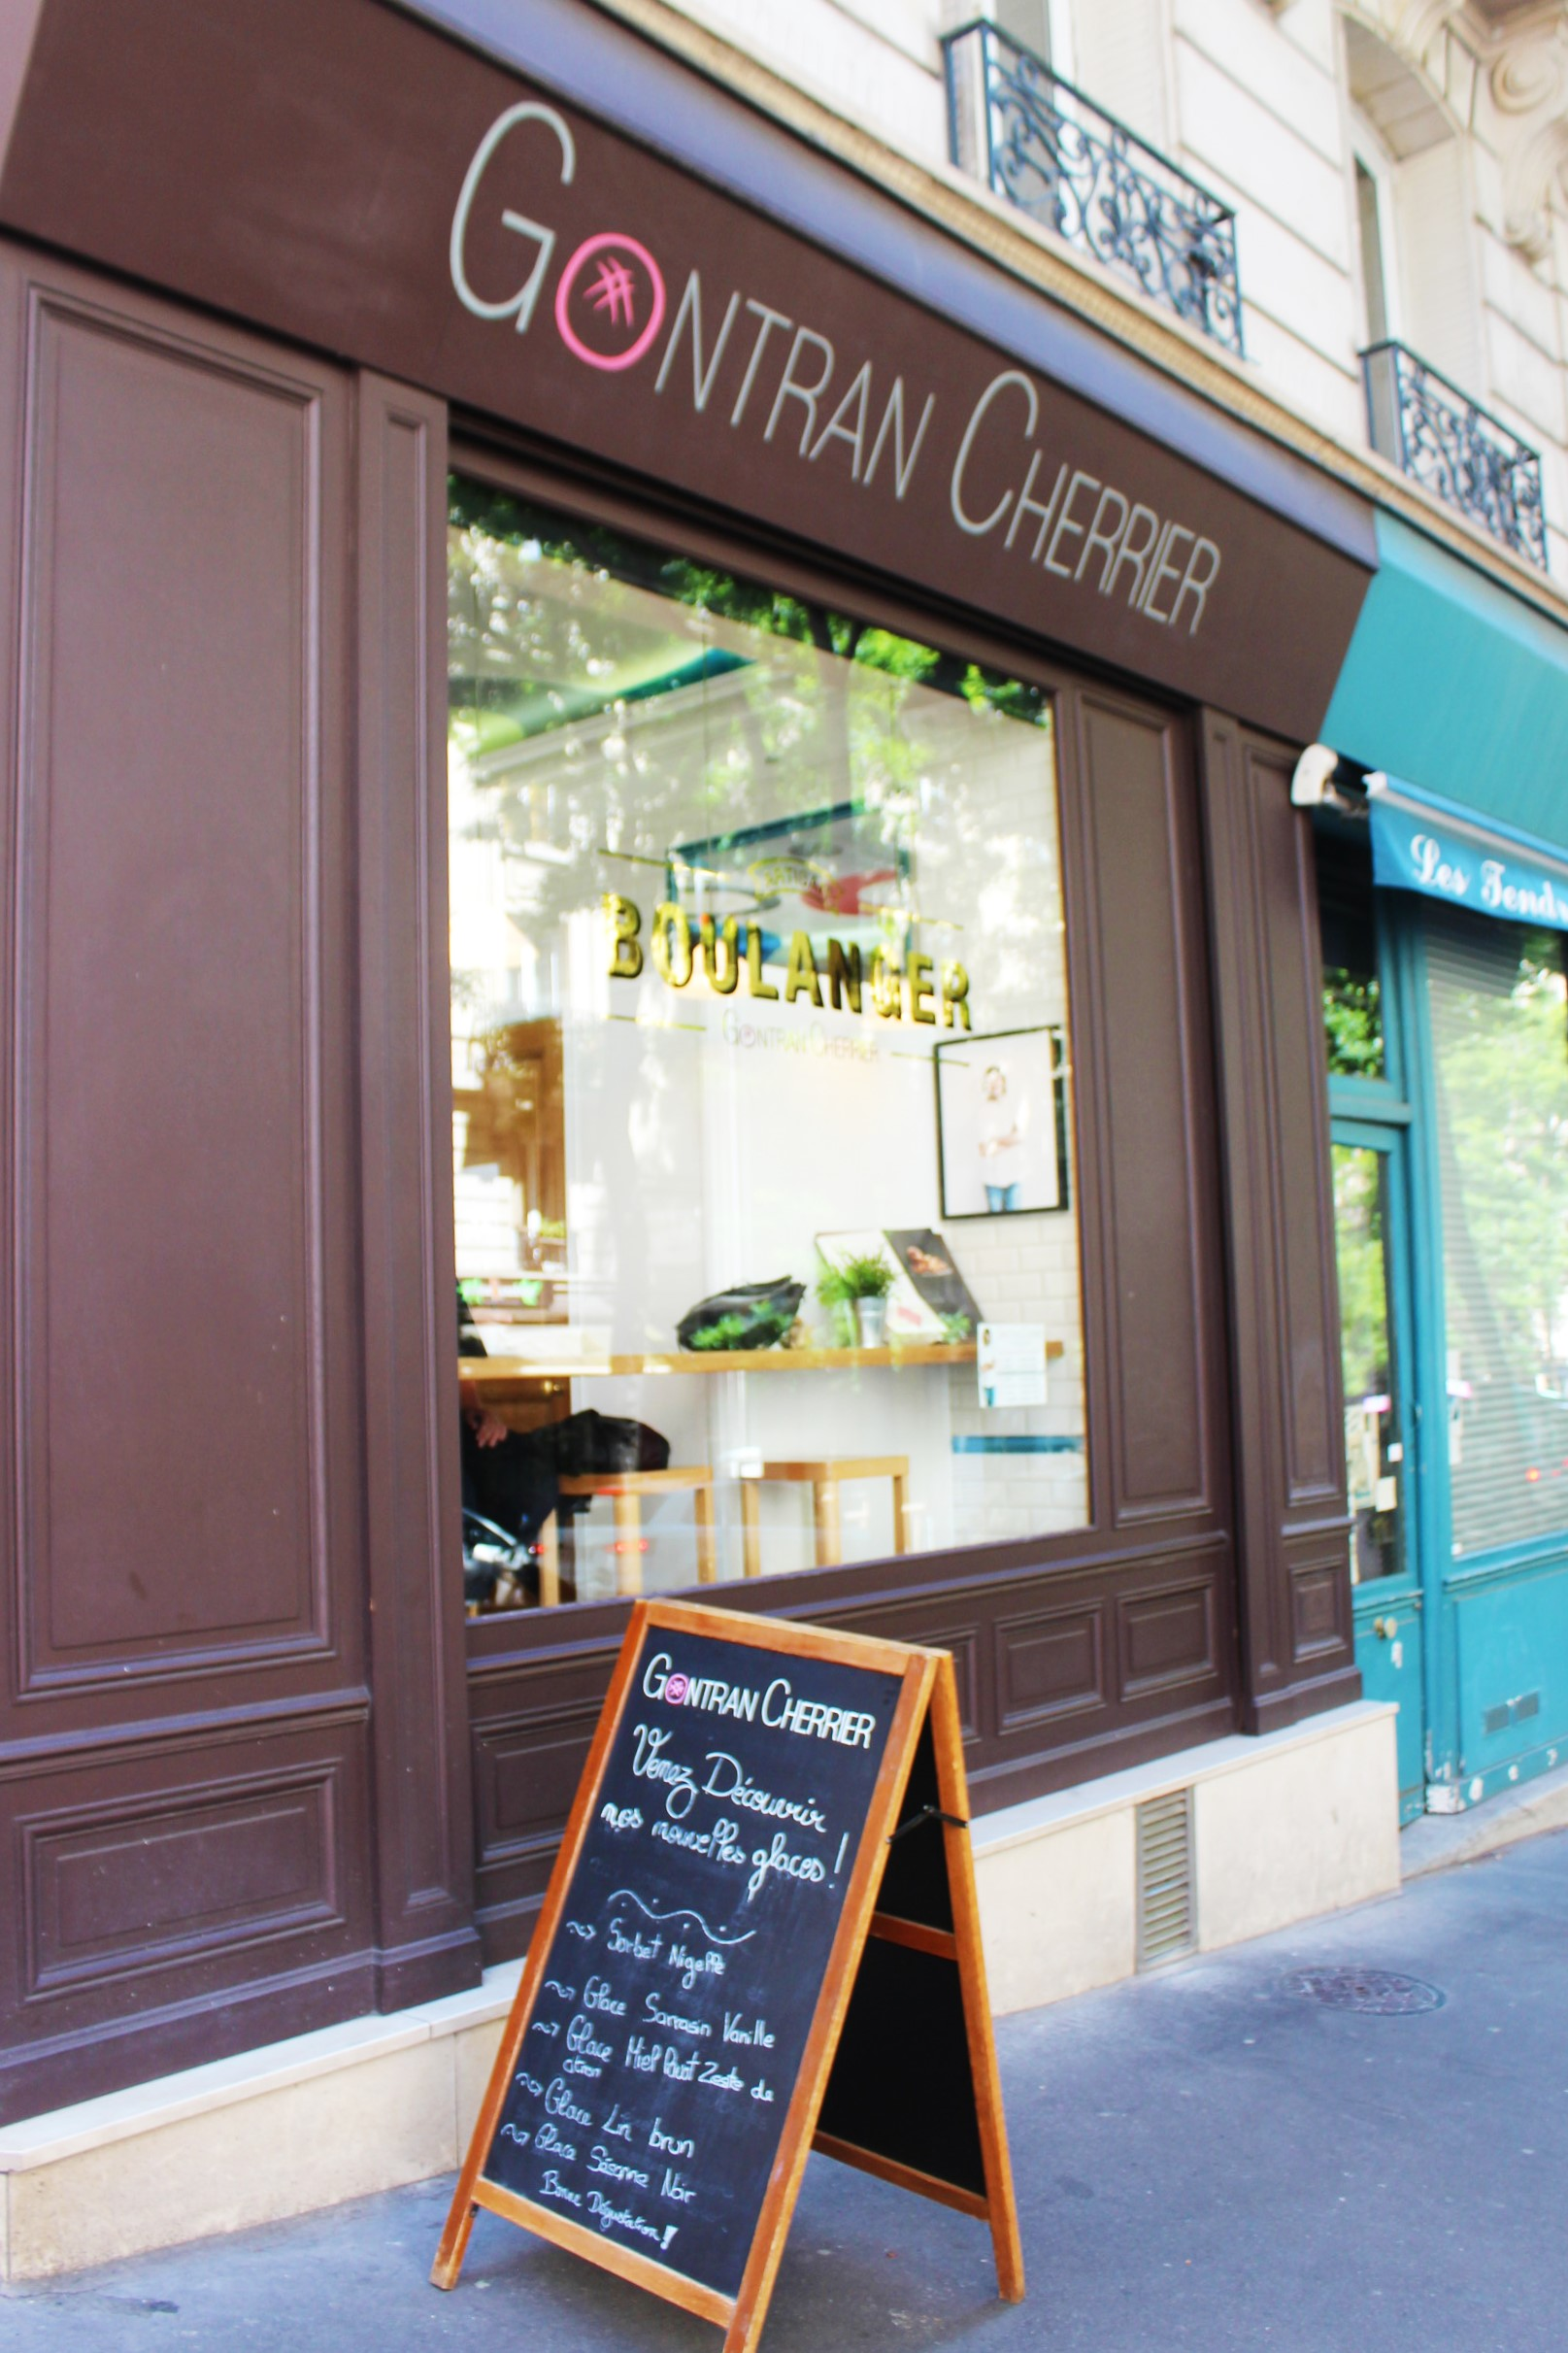 Gontran Cherrier in Paris